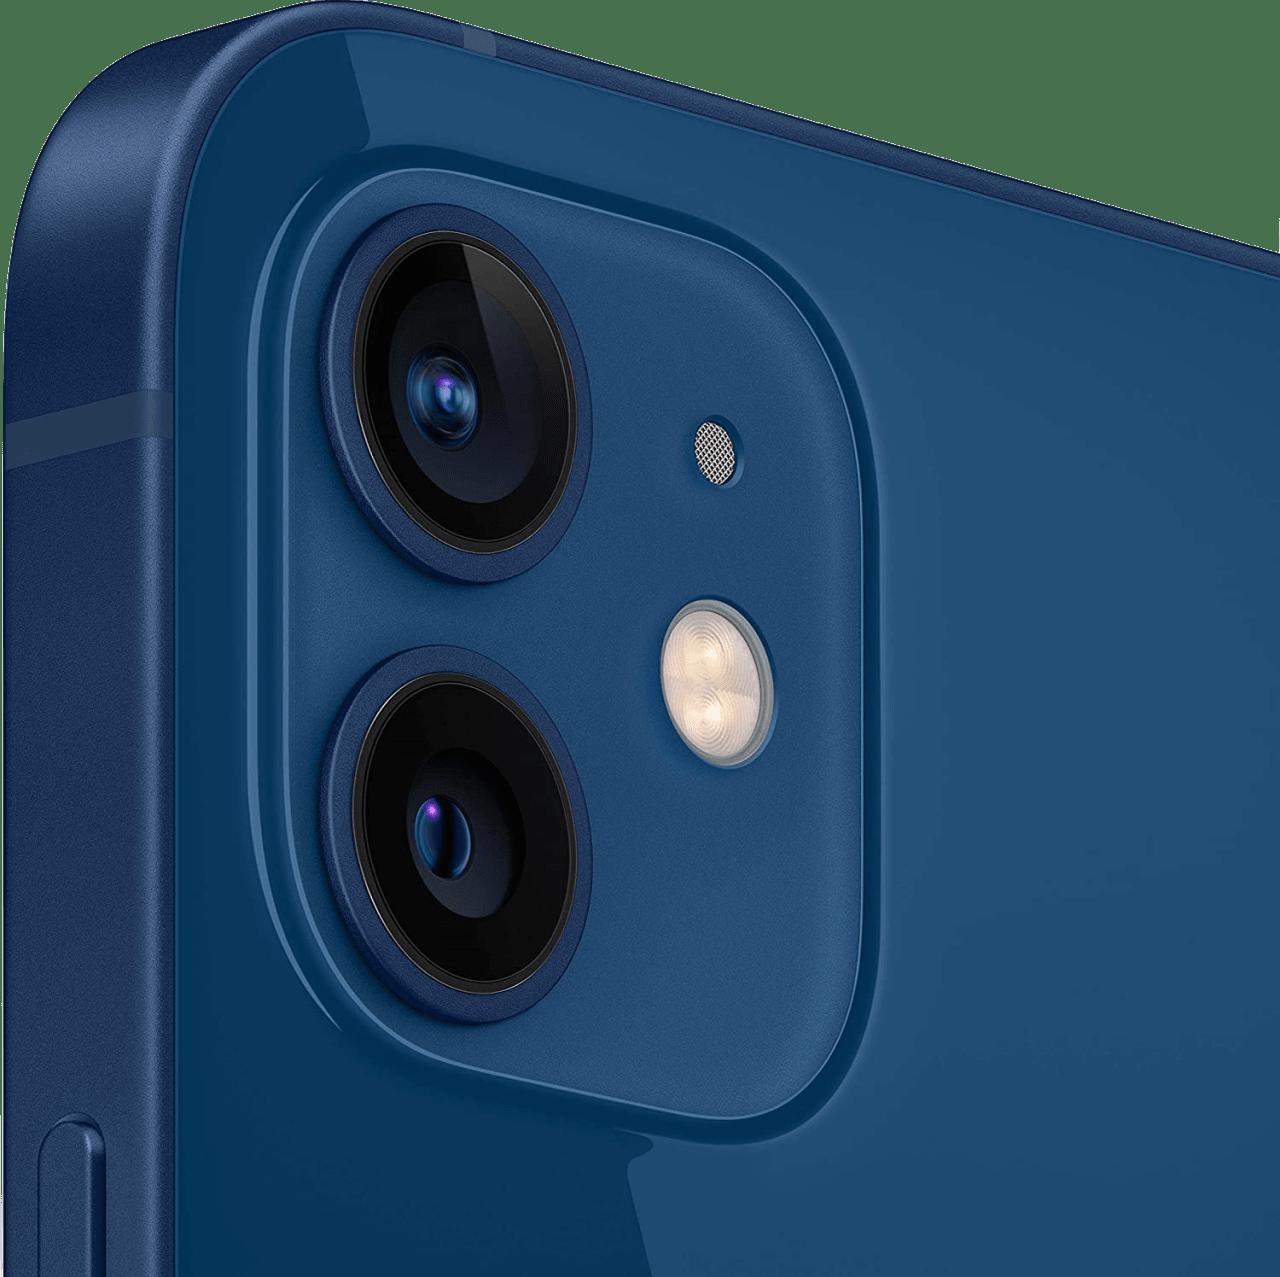 Blue Apple iPhone 12 64GB.3